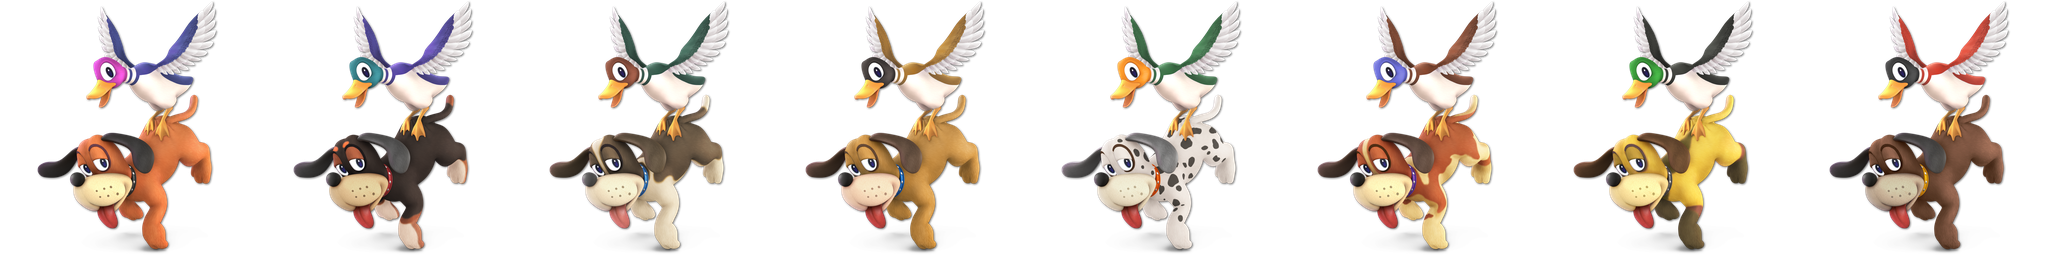 Duck Hunt (Super Smash Bros. Ultimate)